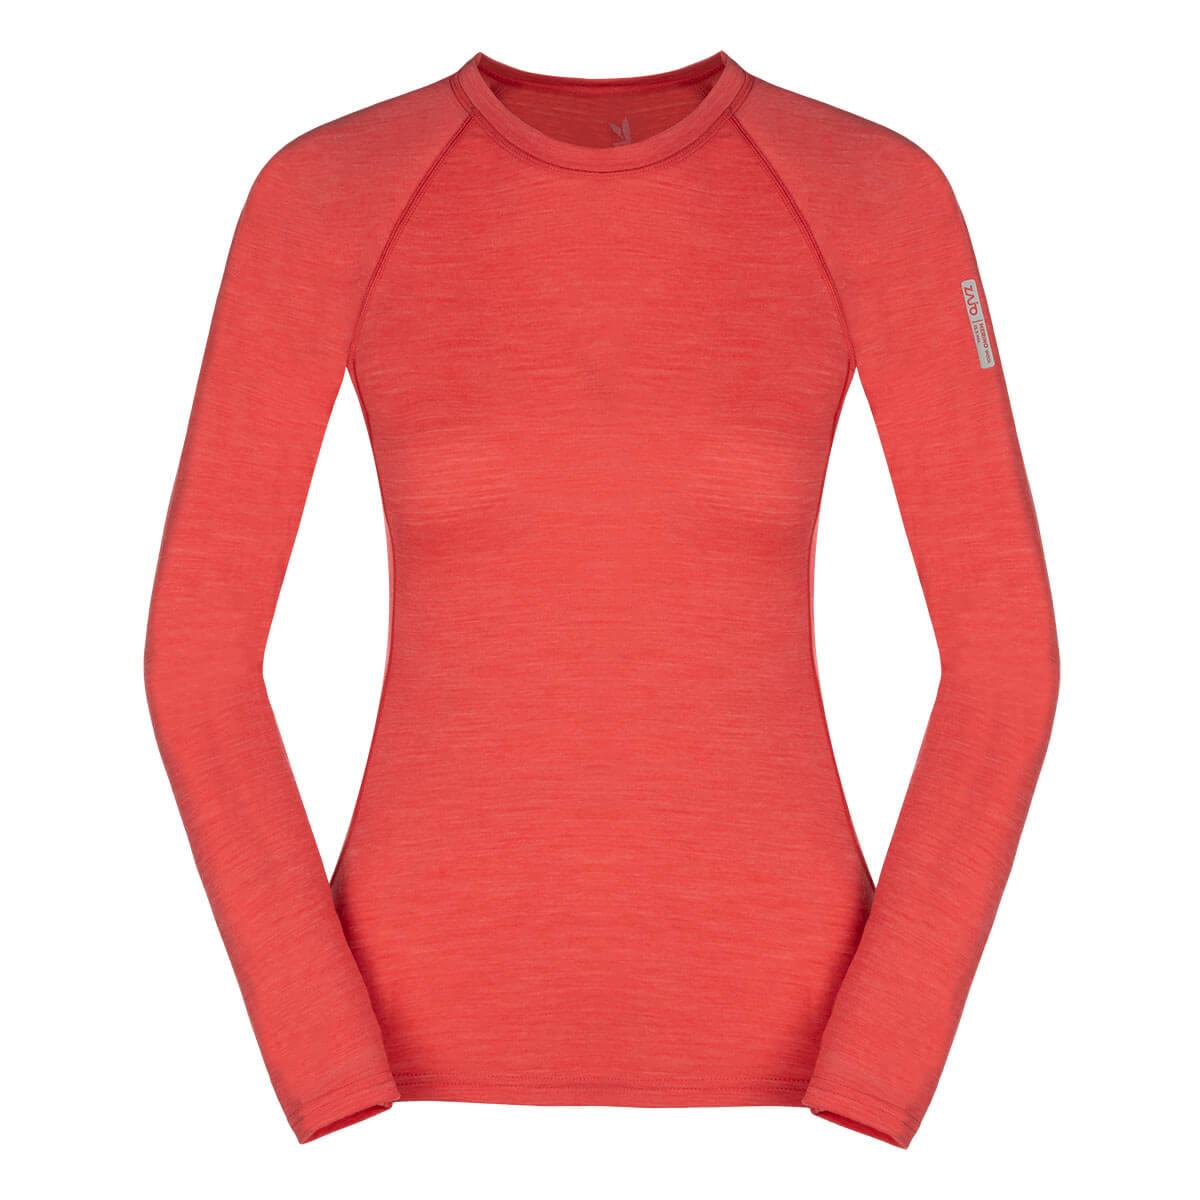 Dámske tričko Zajo Elsa Merino Nylon W T-shirt LS Coral - veľkosť XS